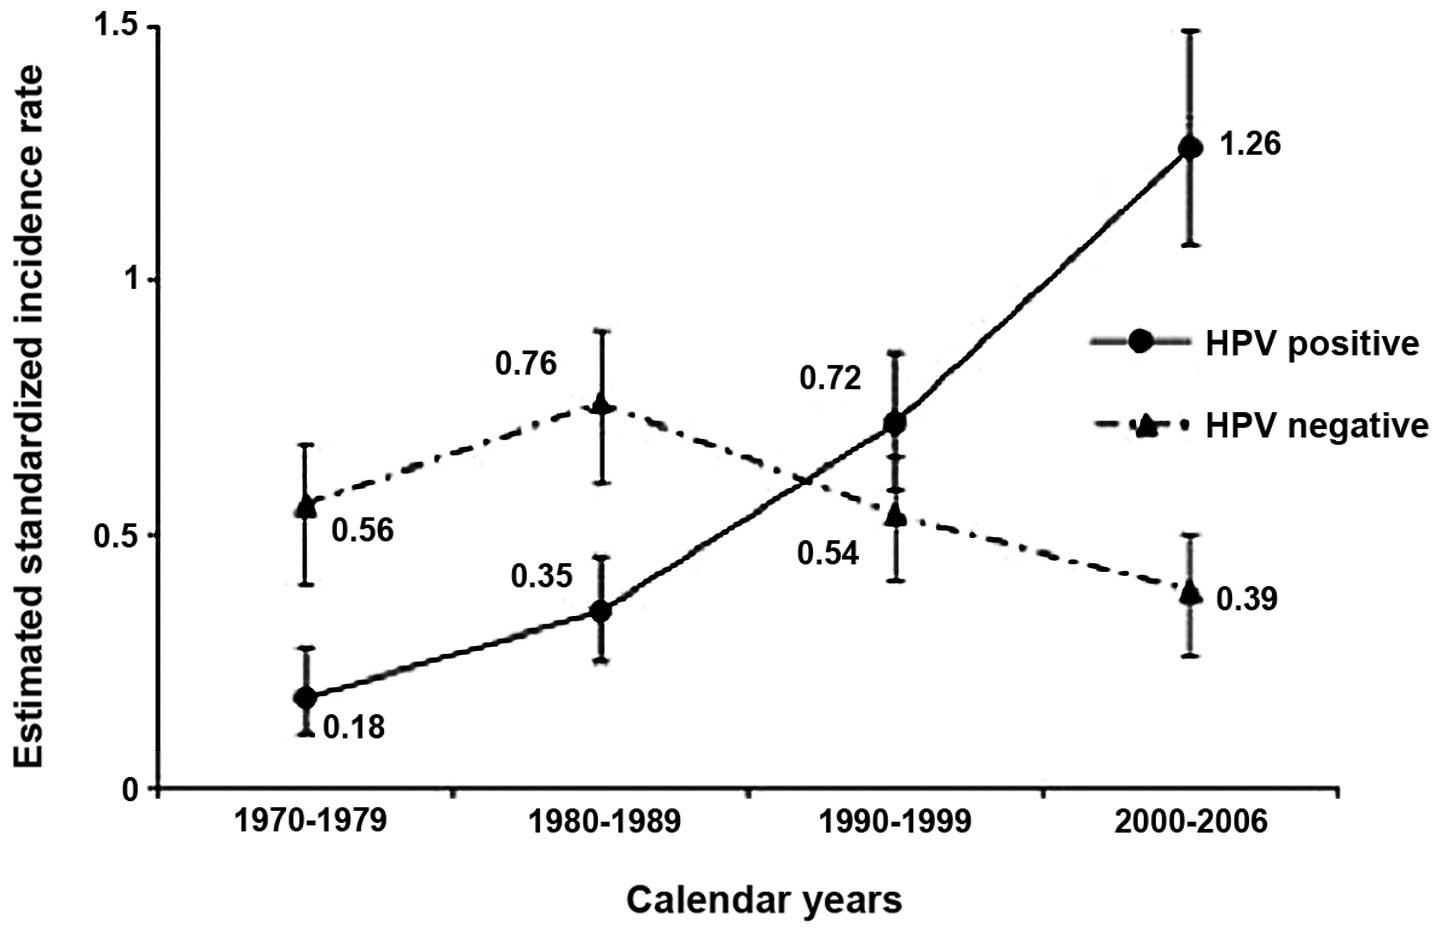 incidence hpv oropharyngeal cancer hepatocellular cancer markers